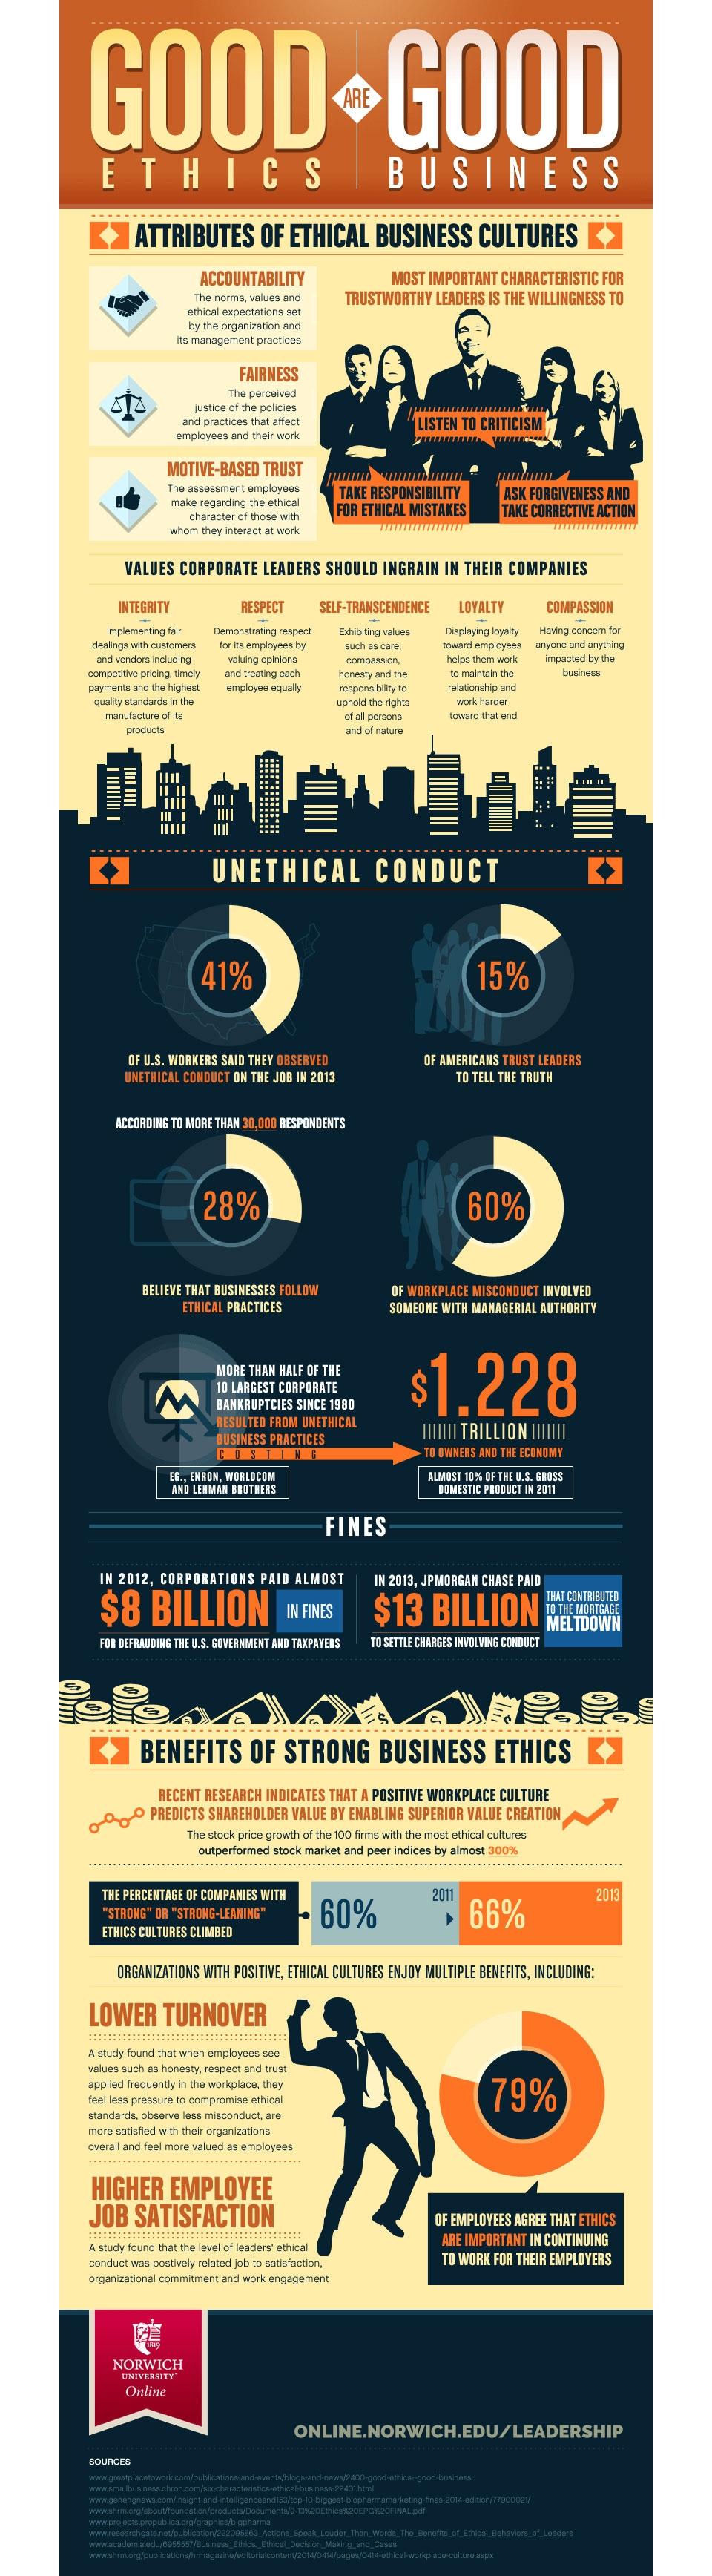 good ethics infographic image